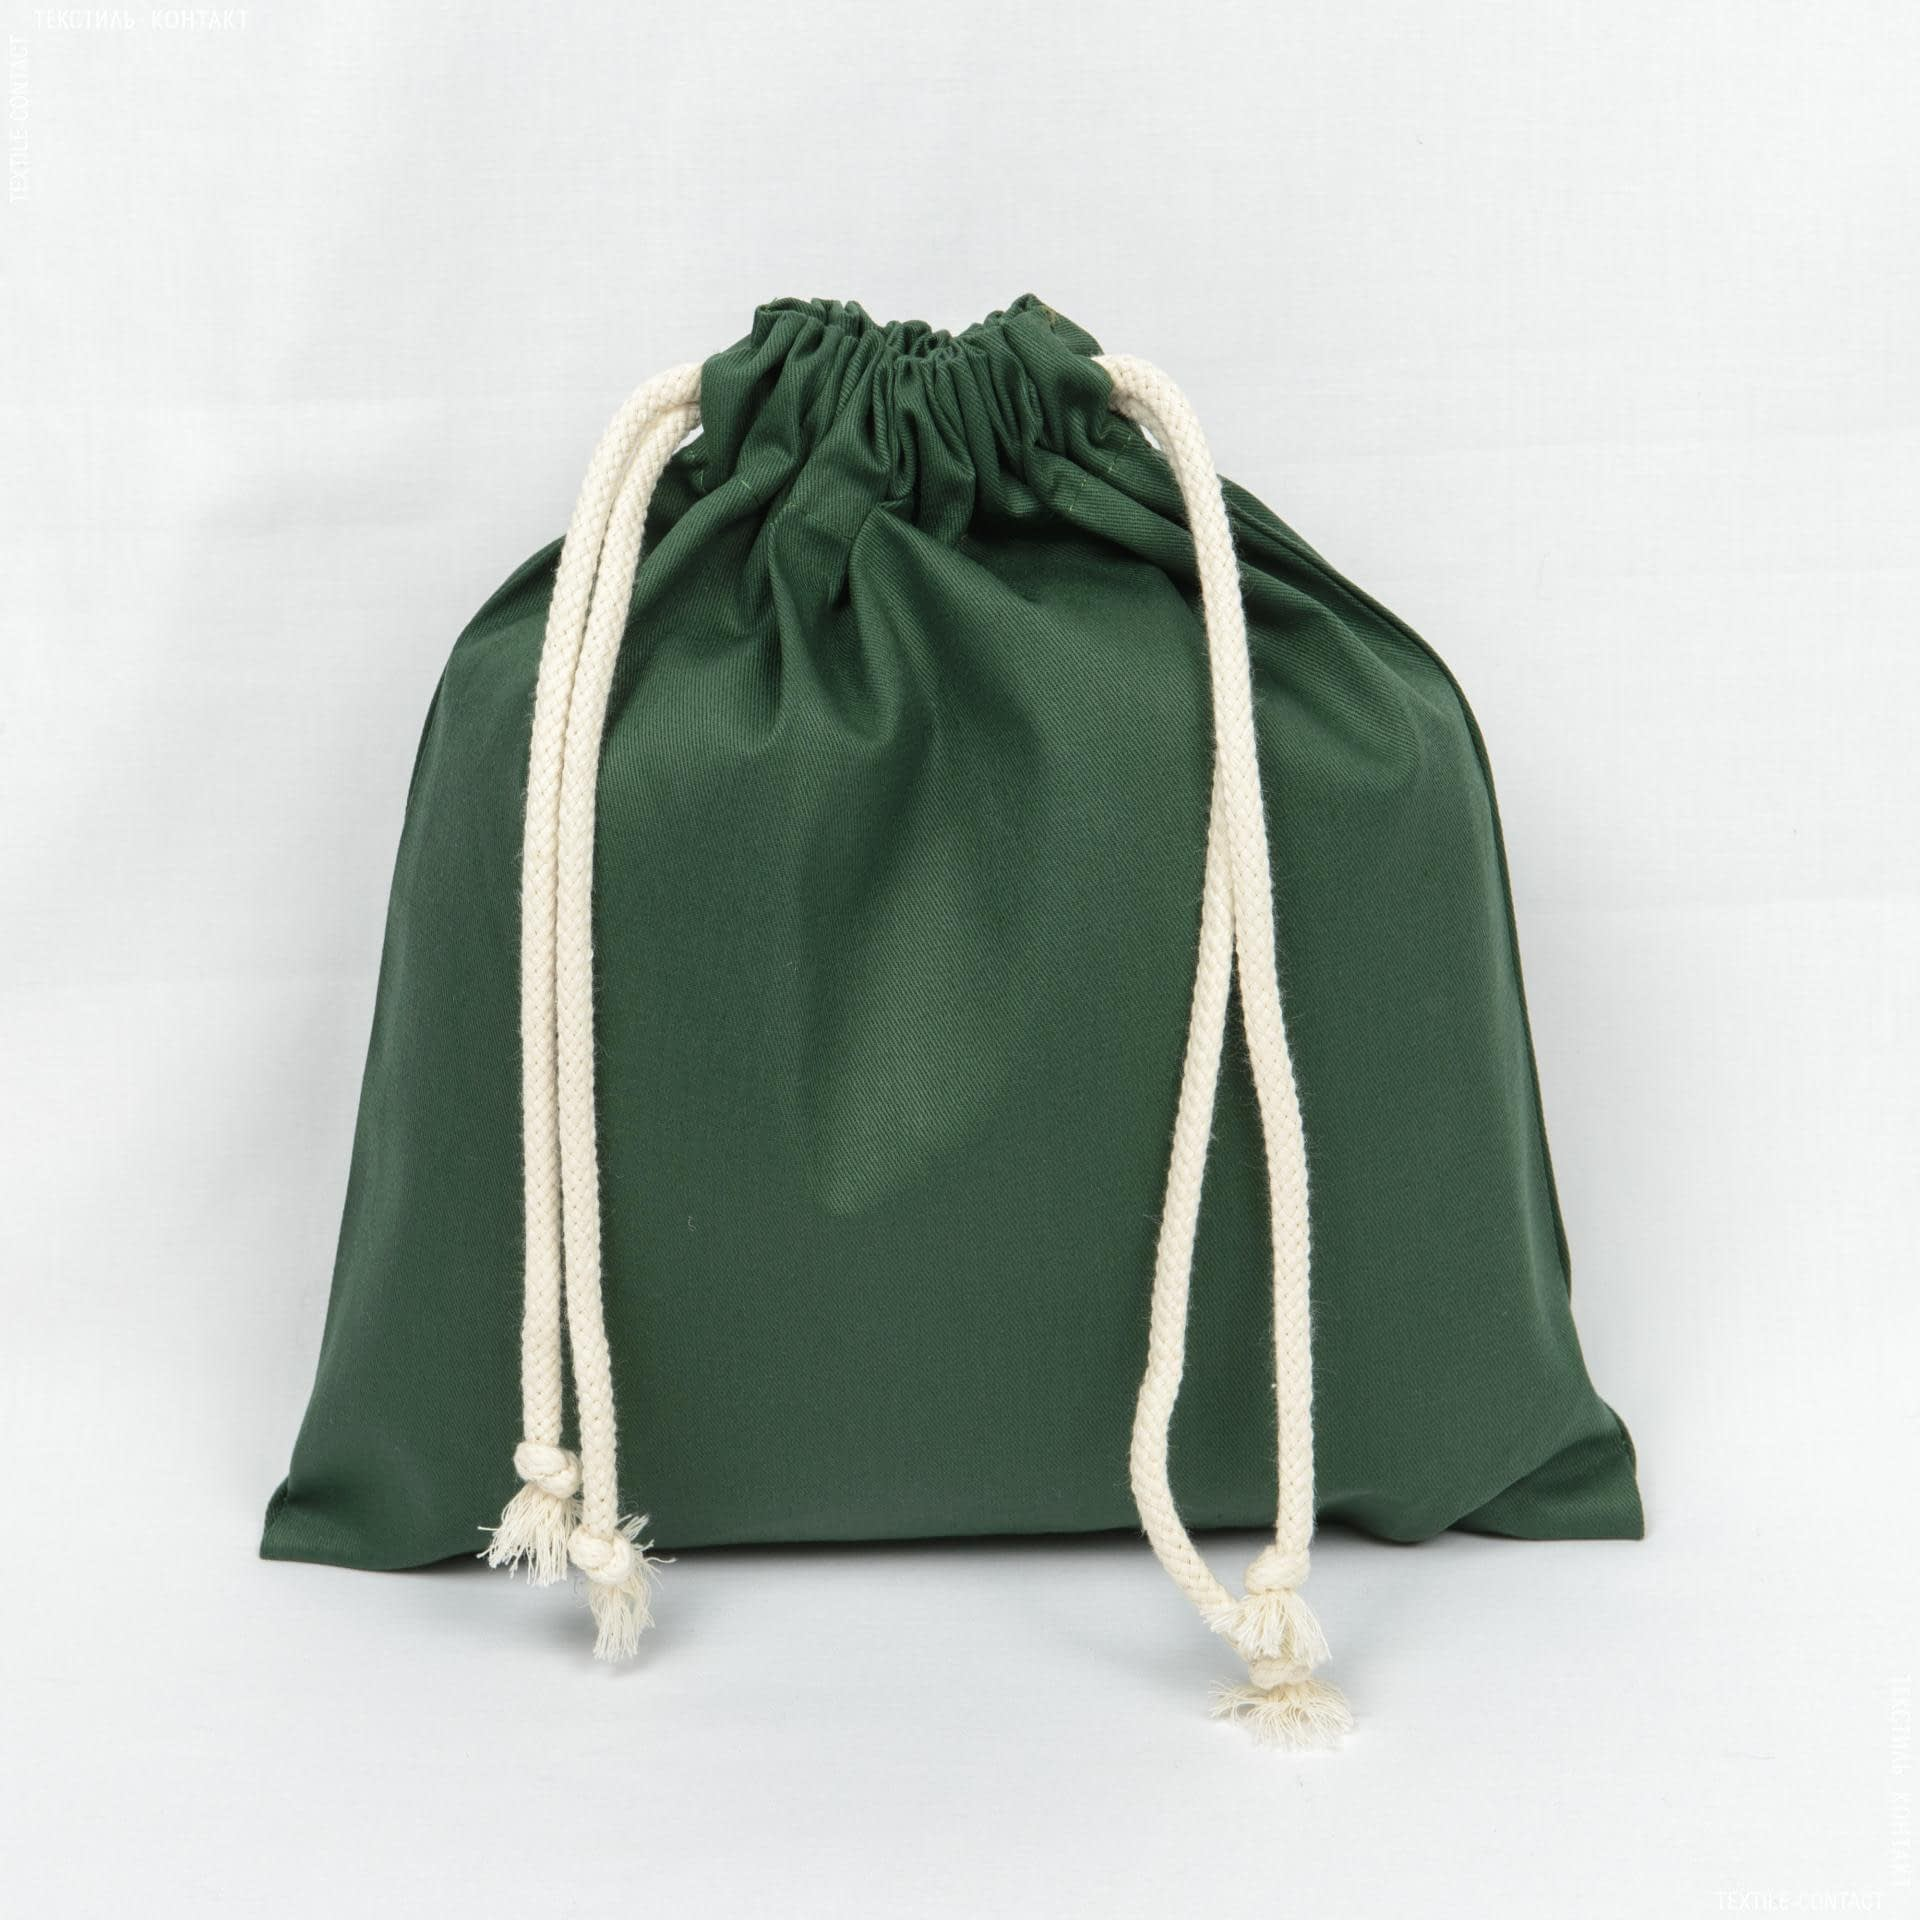 Ткани экосумка - Мешочек саржа зеленый 30х33